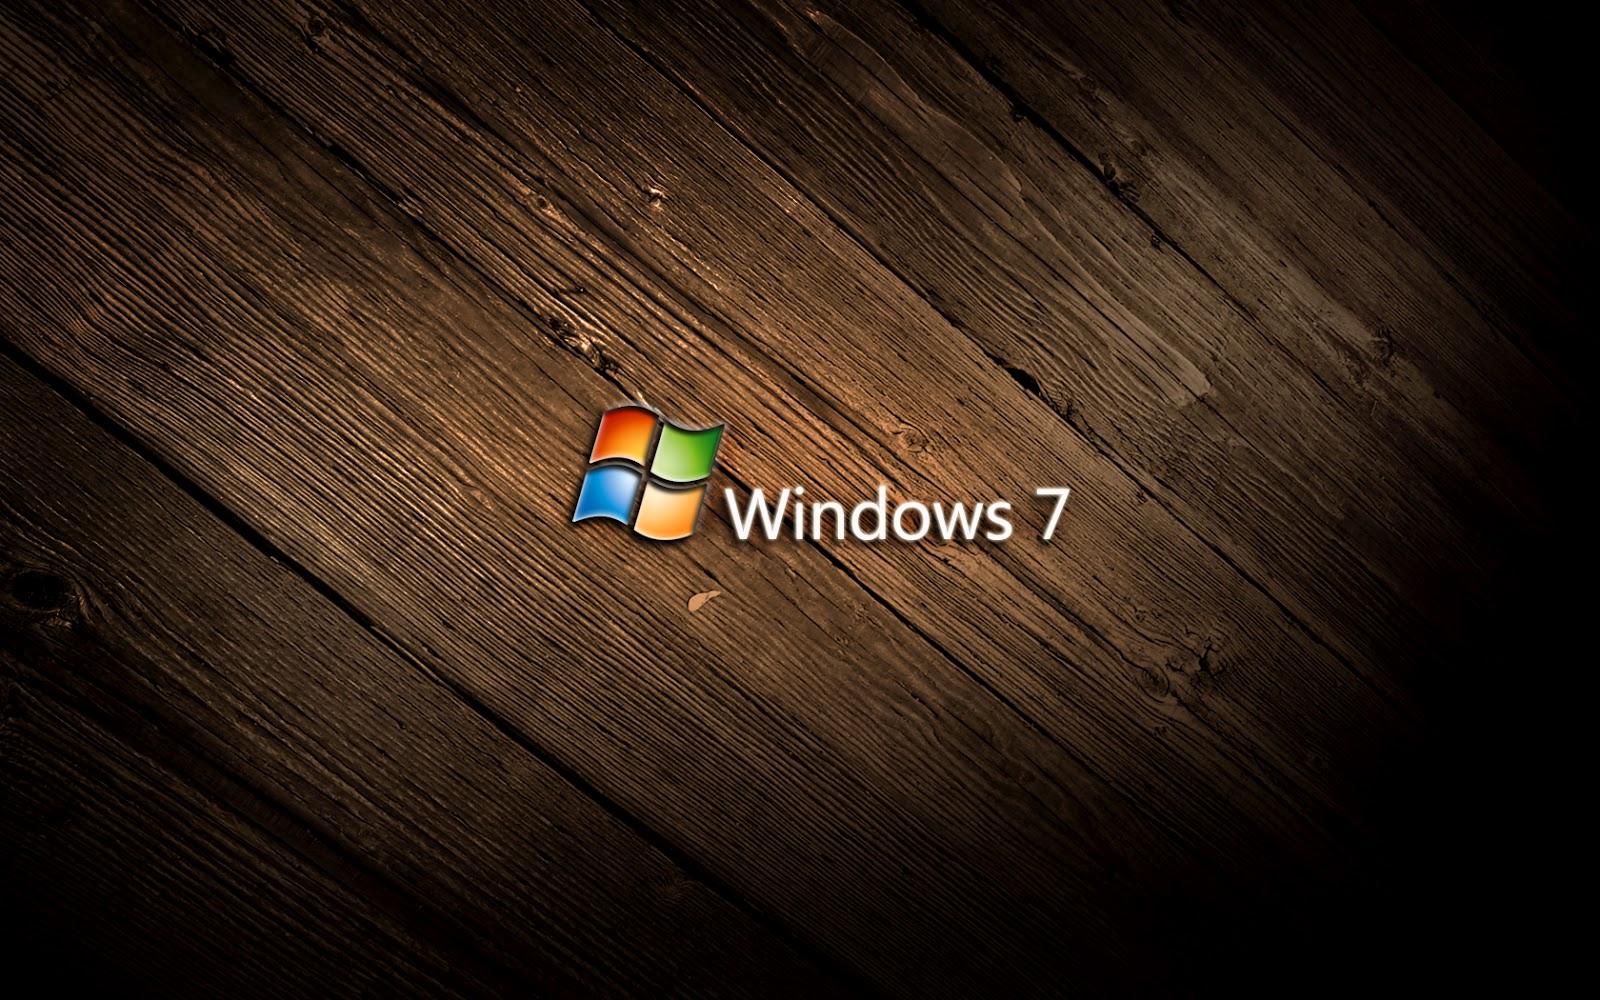 Windows 7 HD Desktop Backgrounds Group (85+)